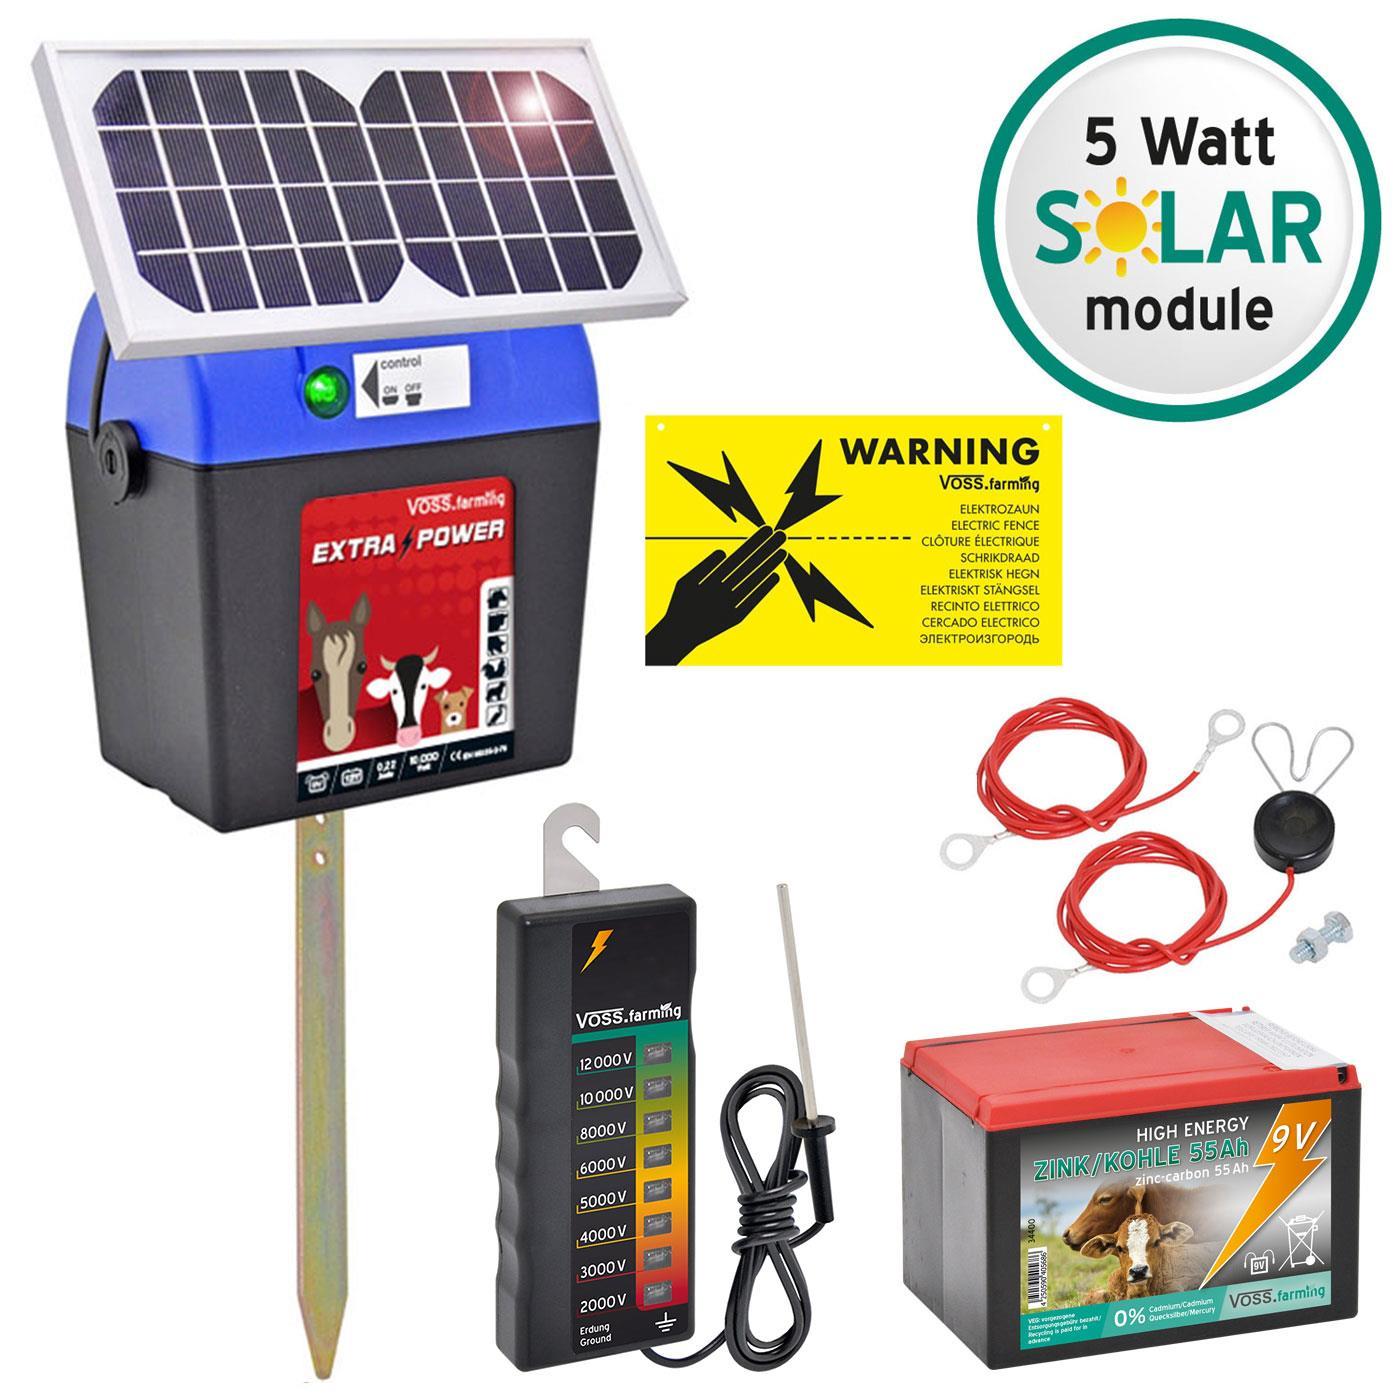 Pannello Solare Per Recinto Elettrico : V voss farming quot extra power solar electric fence